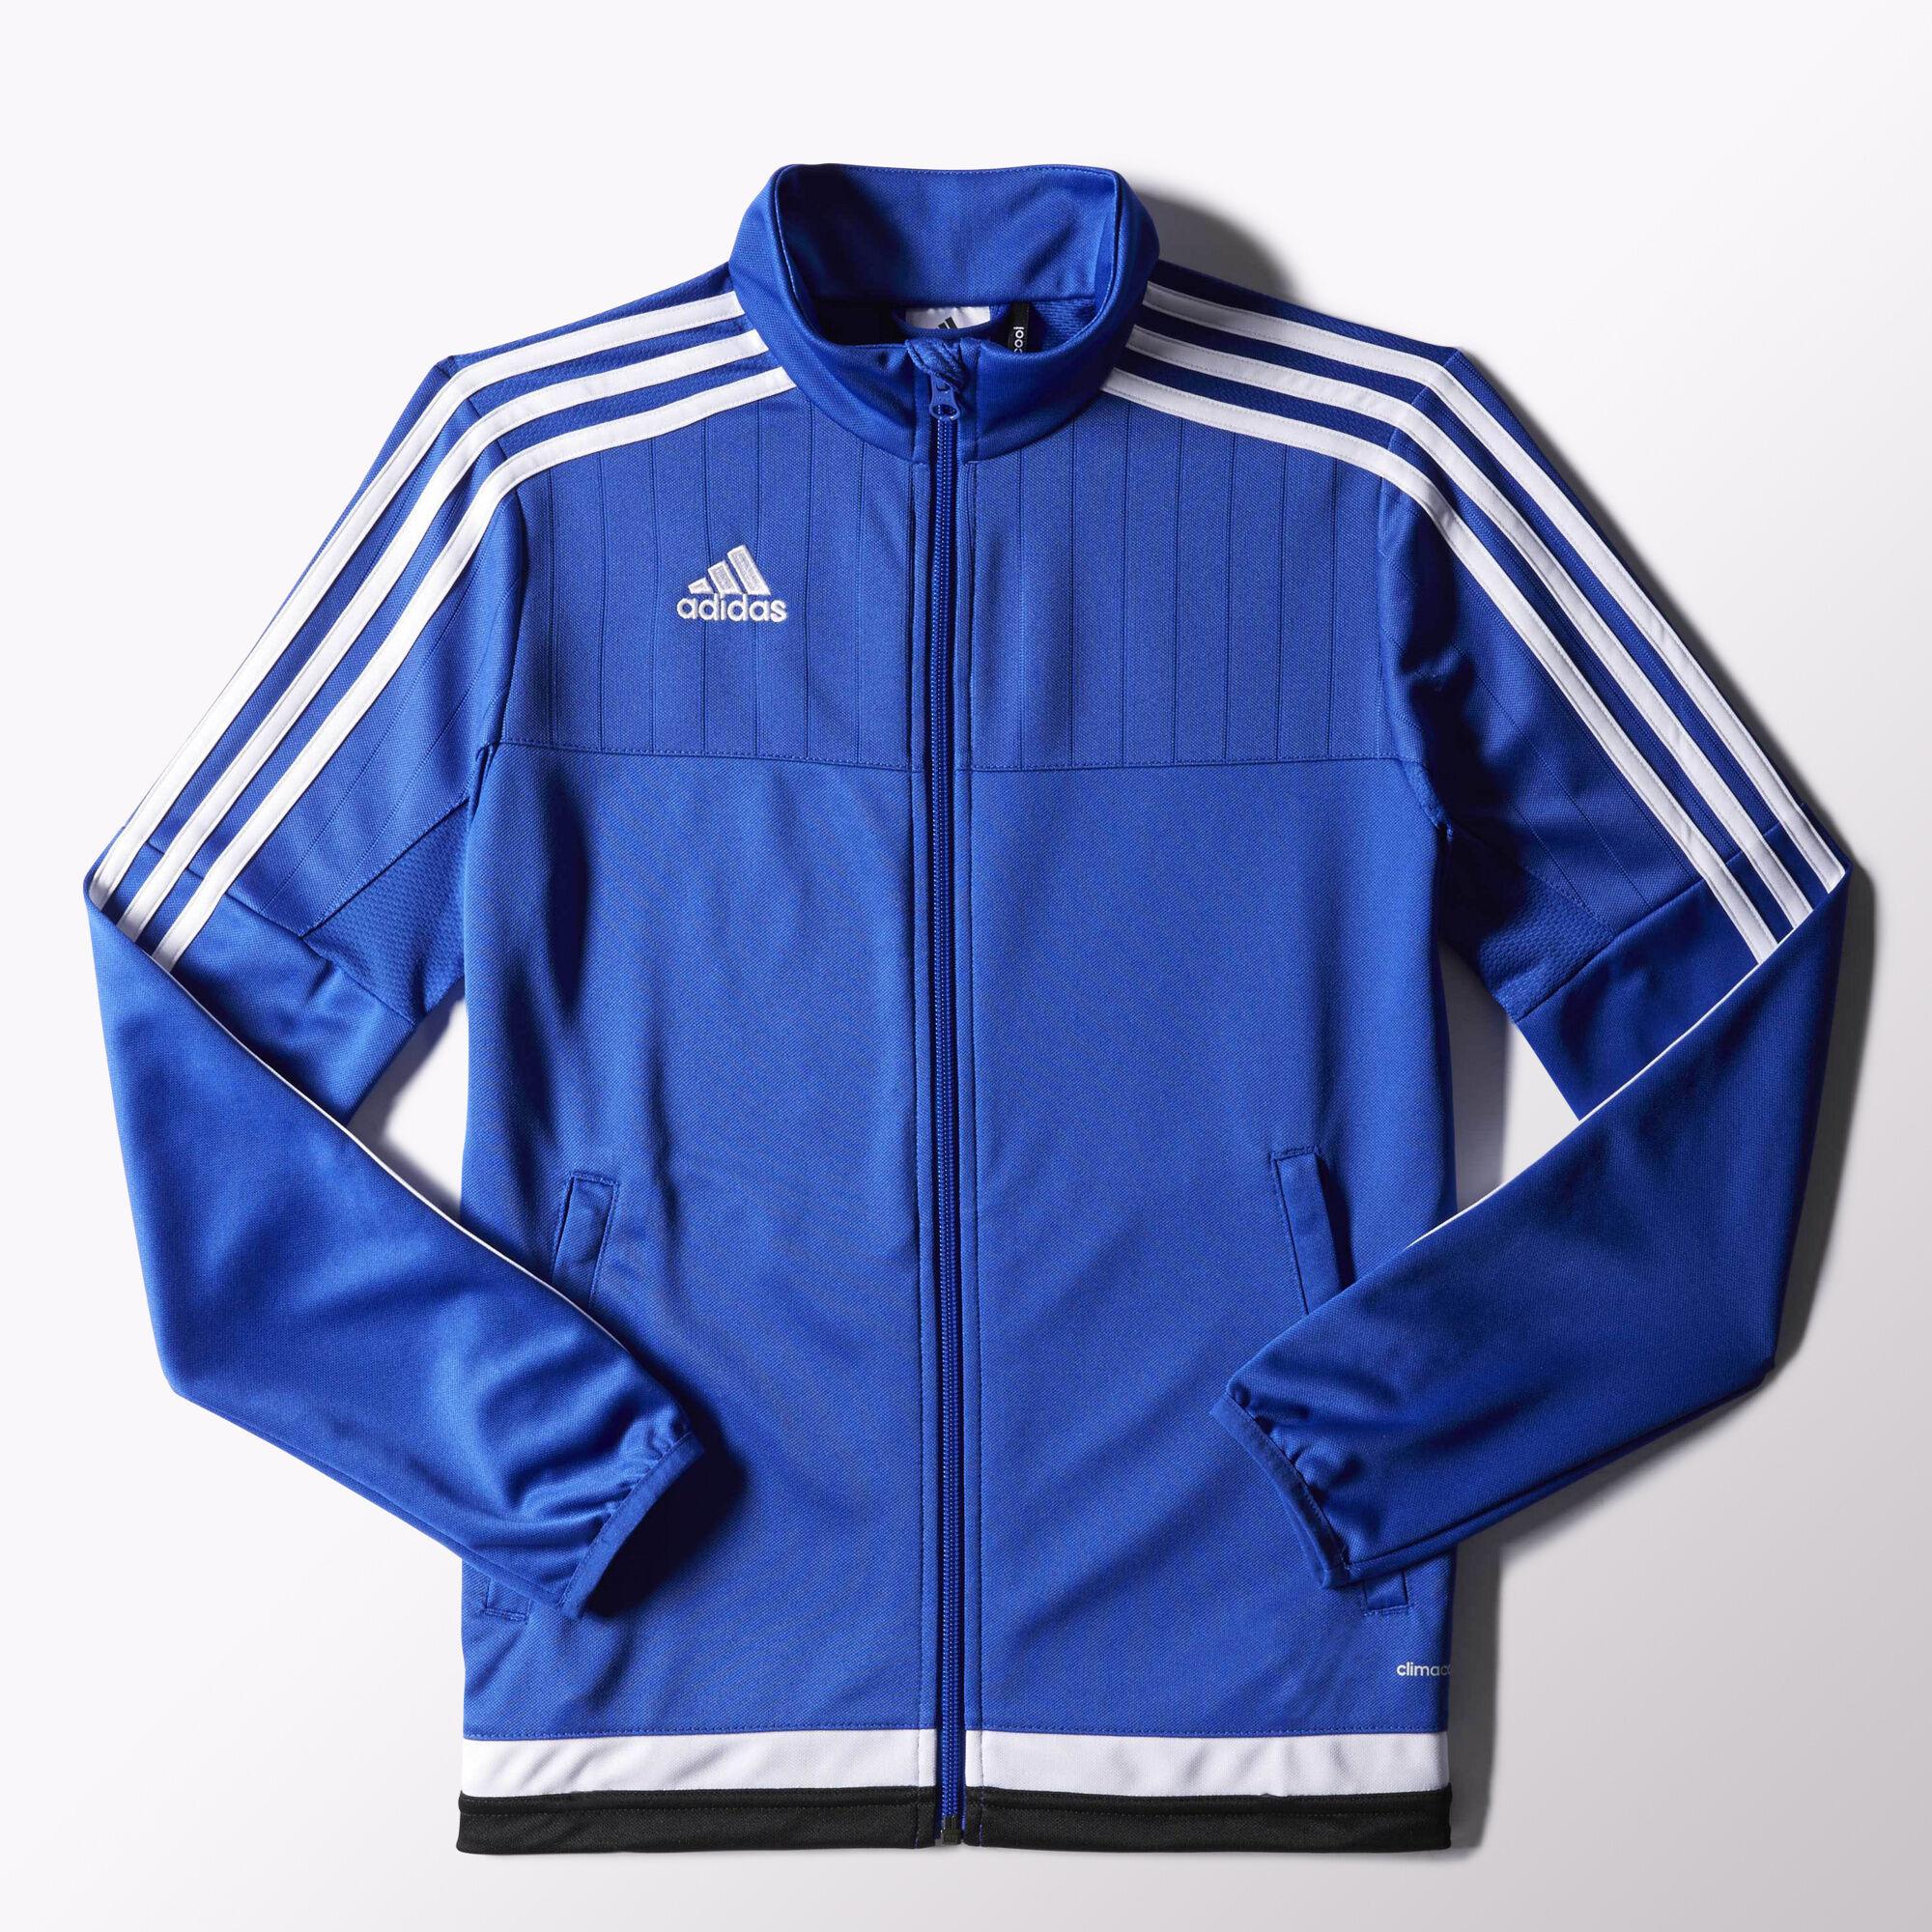 adidas youth soccer jacket